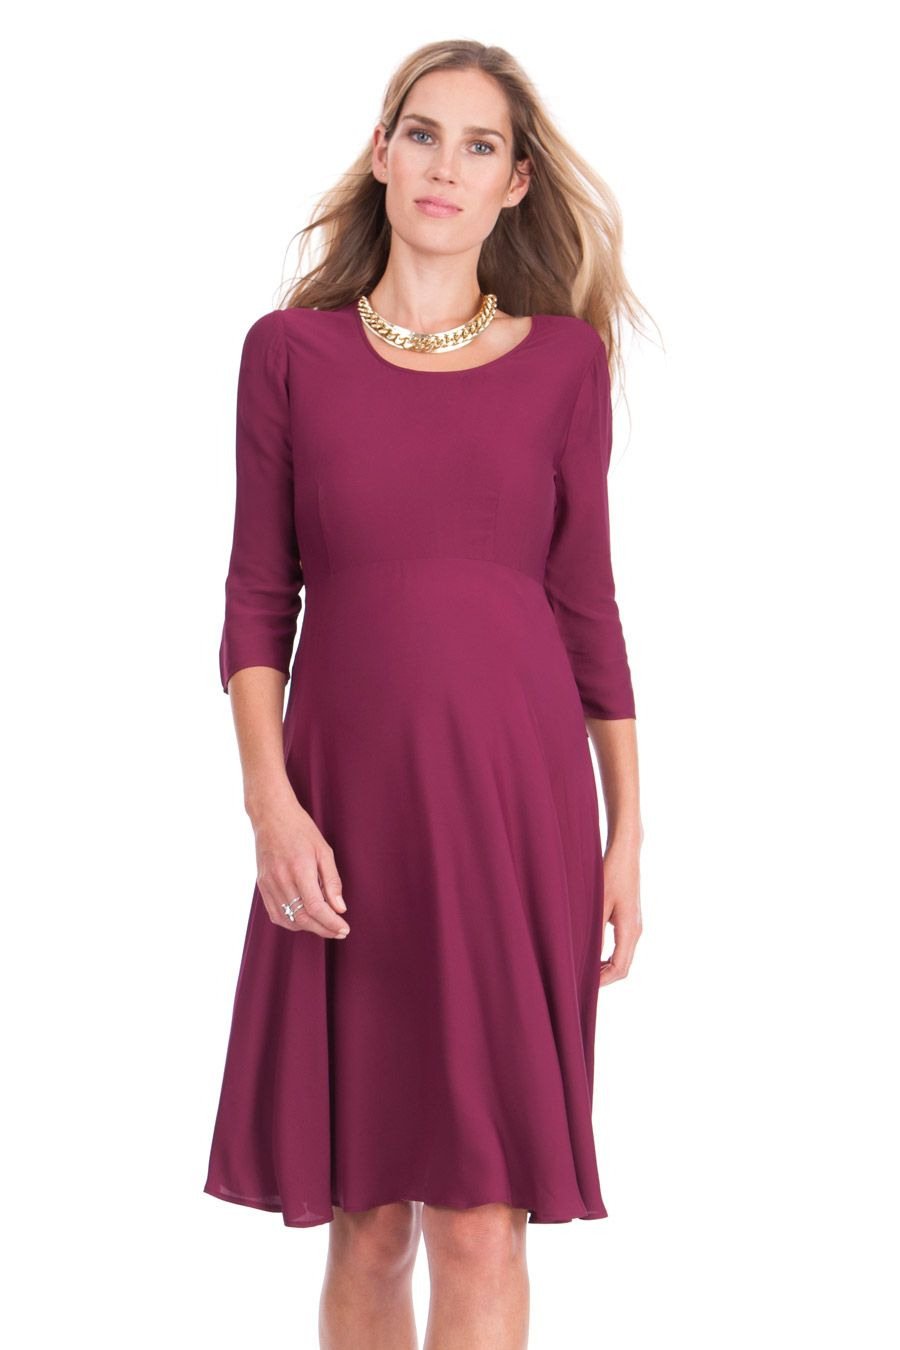 Umstandskleid Mit Tellerrock  Langarm Kleider